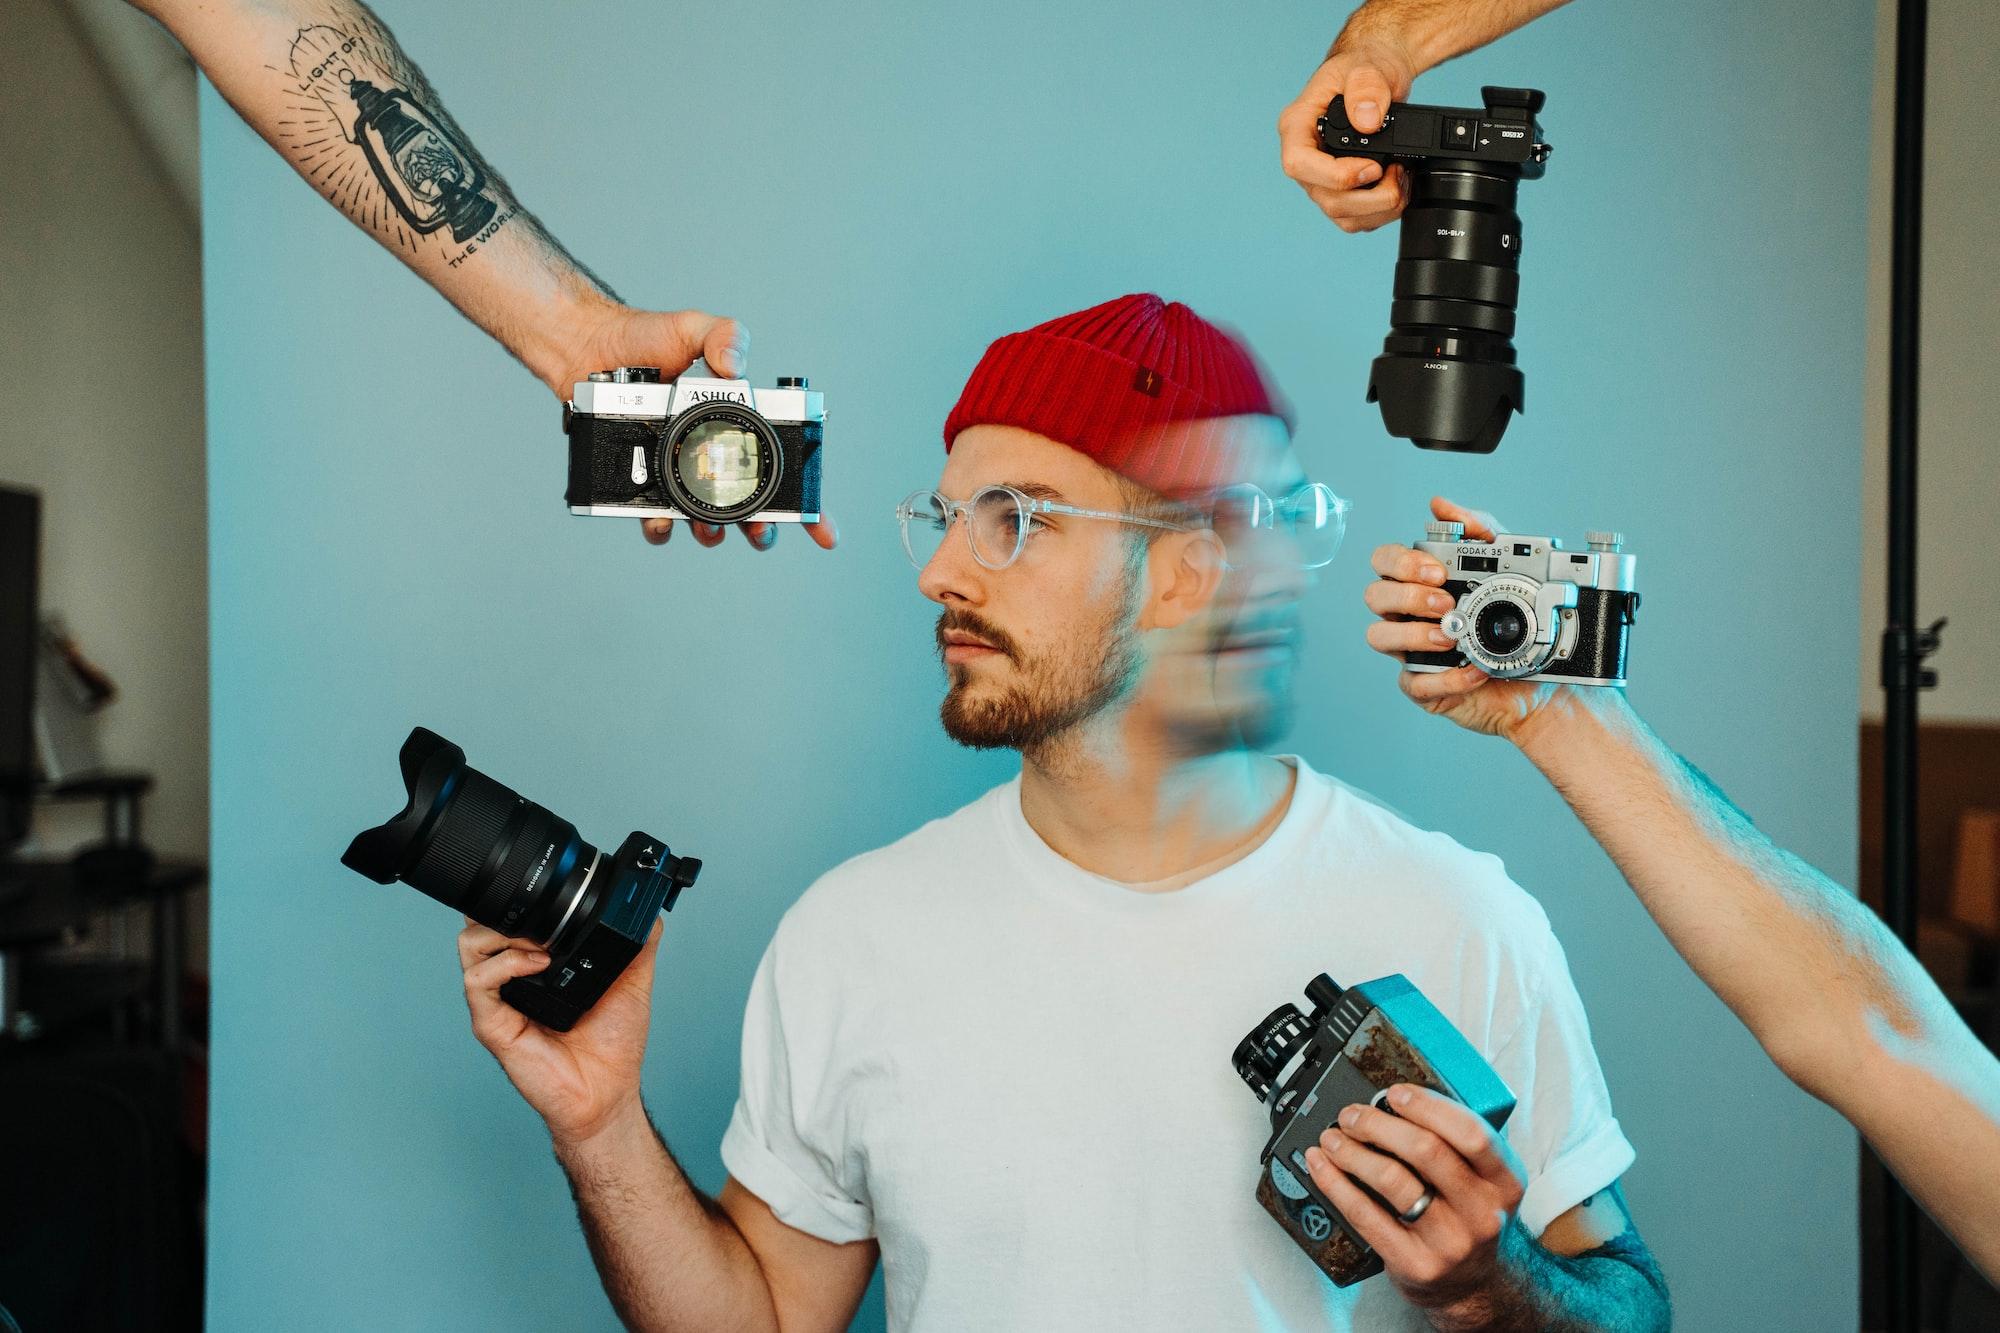 Creative Self Portrait with Camera